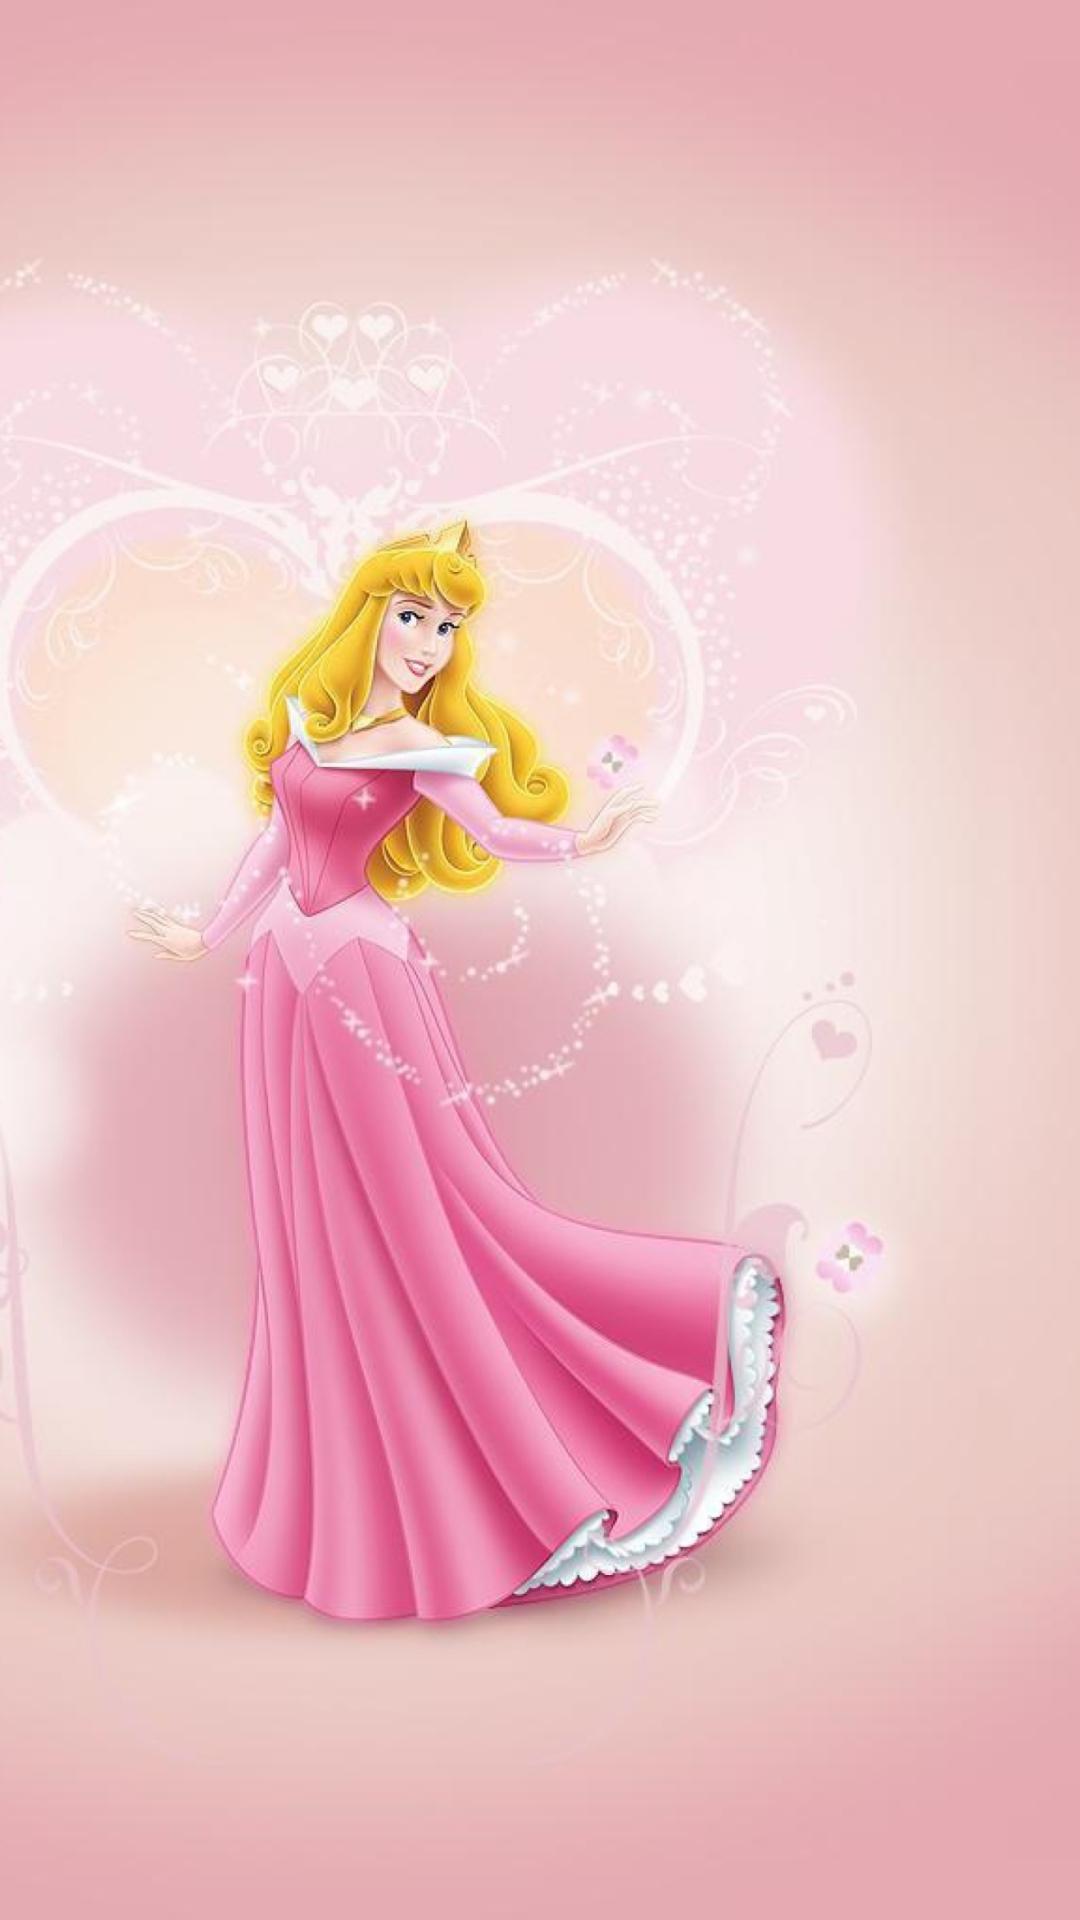 Princess Aurora Disney Wallpaper for iPhone 6 Plus